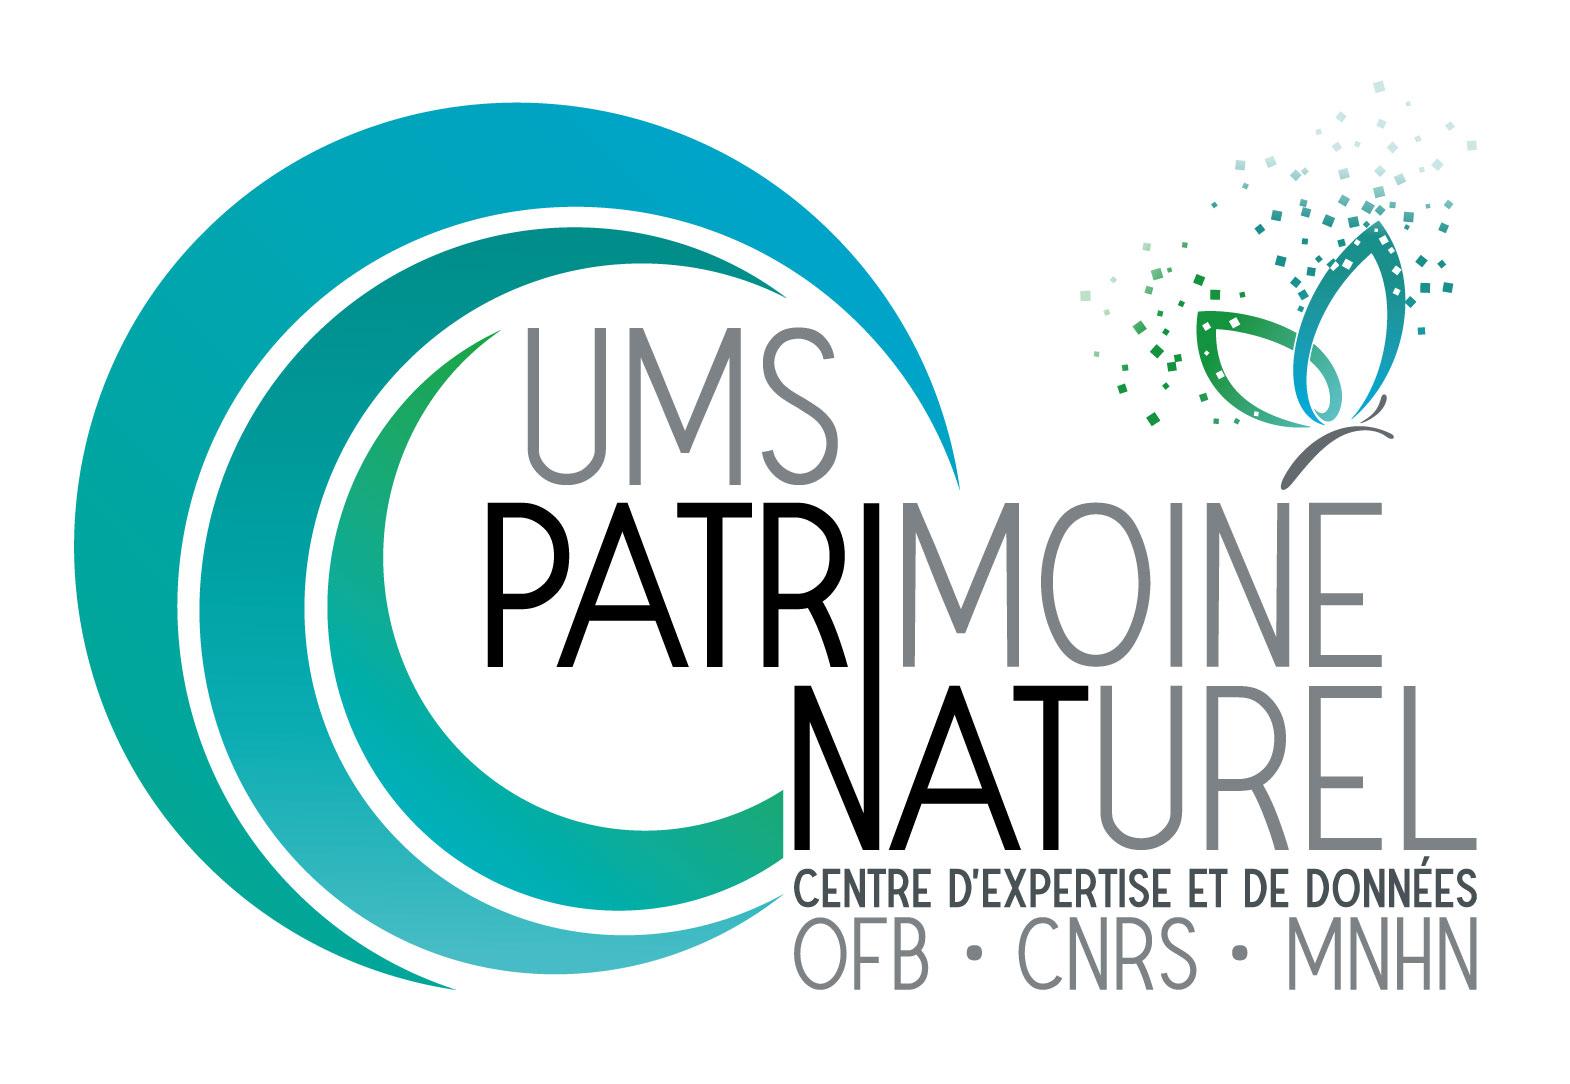 Logo UMS patrimoines naturels